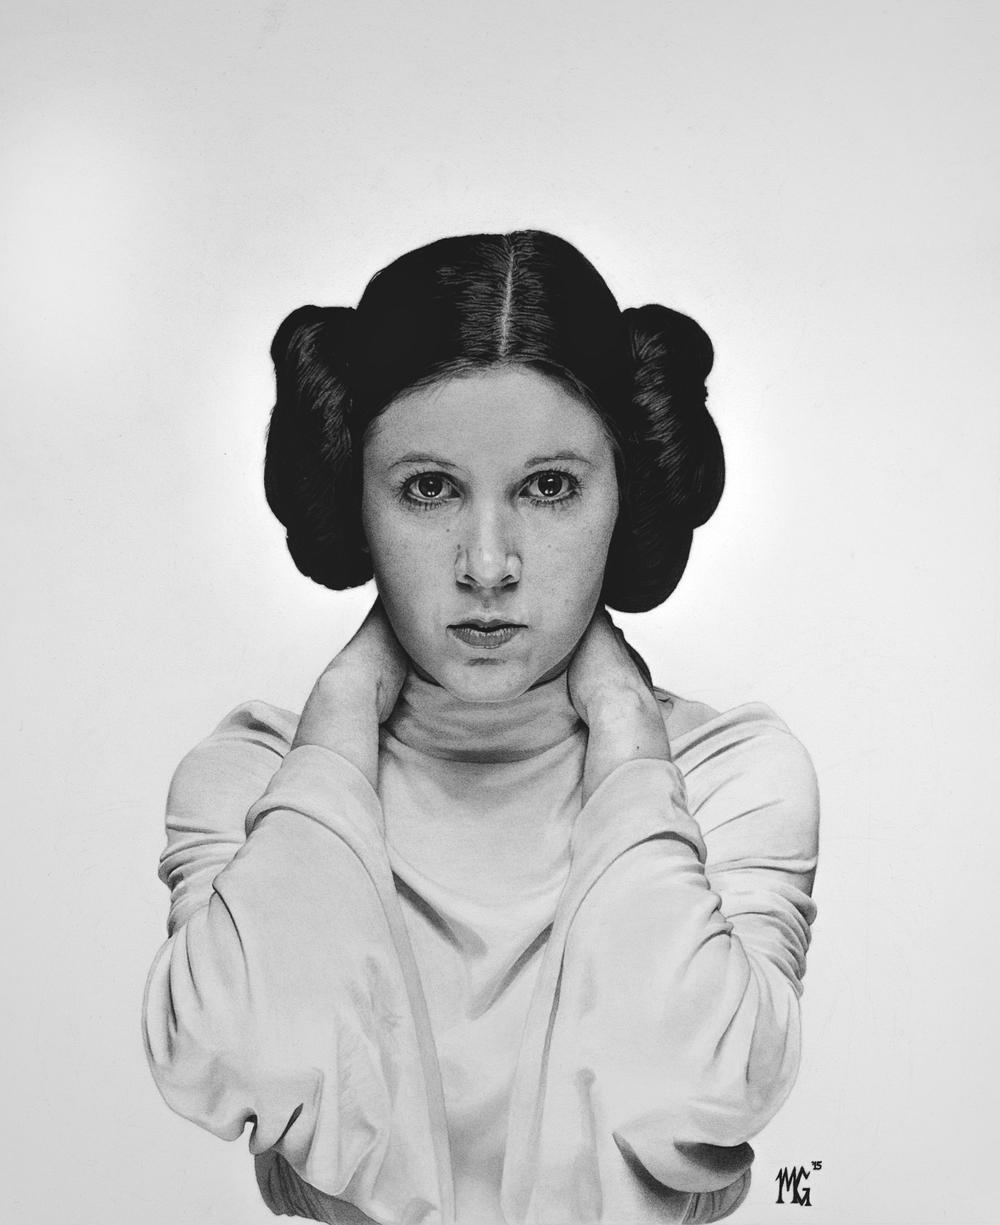 Leia_StarWars_LoResCropped_mgdrawing.jpg